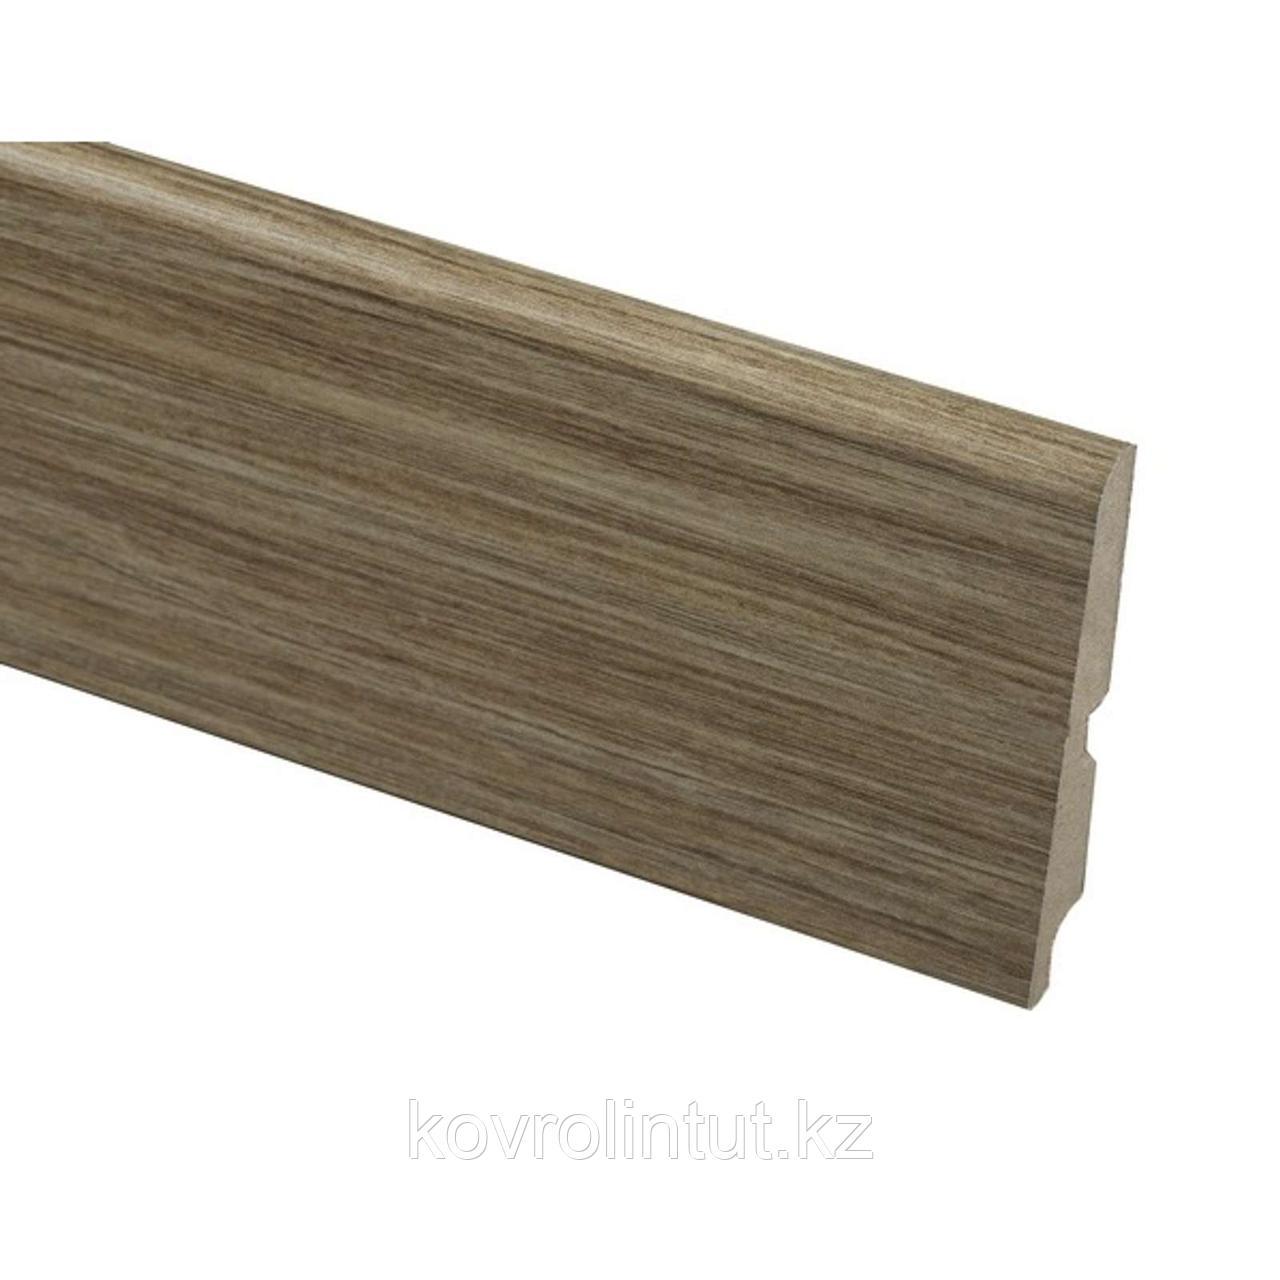 Плинтус Kronopol P85 4560 Kiko Oak, 2500х85х16мм, 9шт/уп